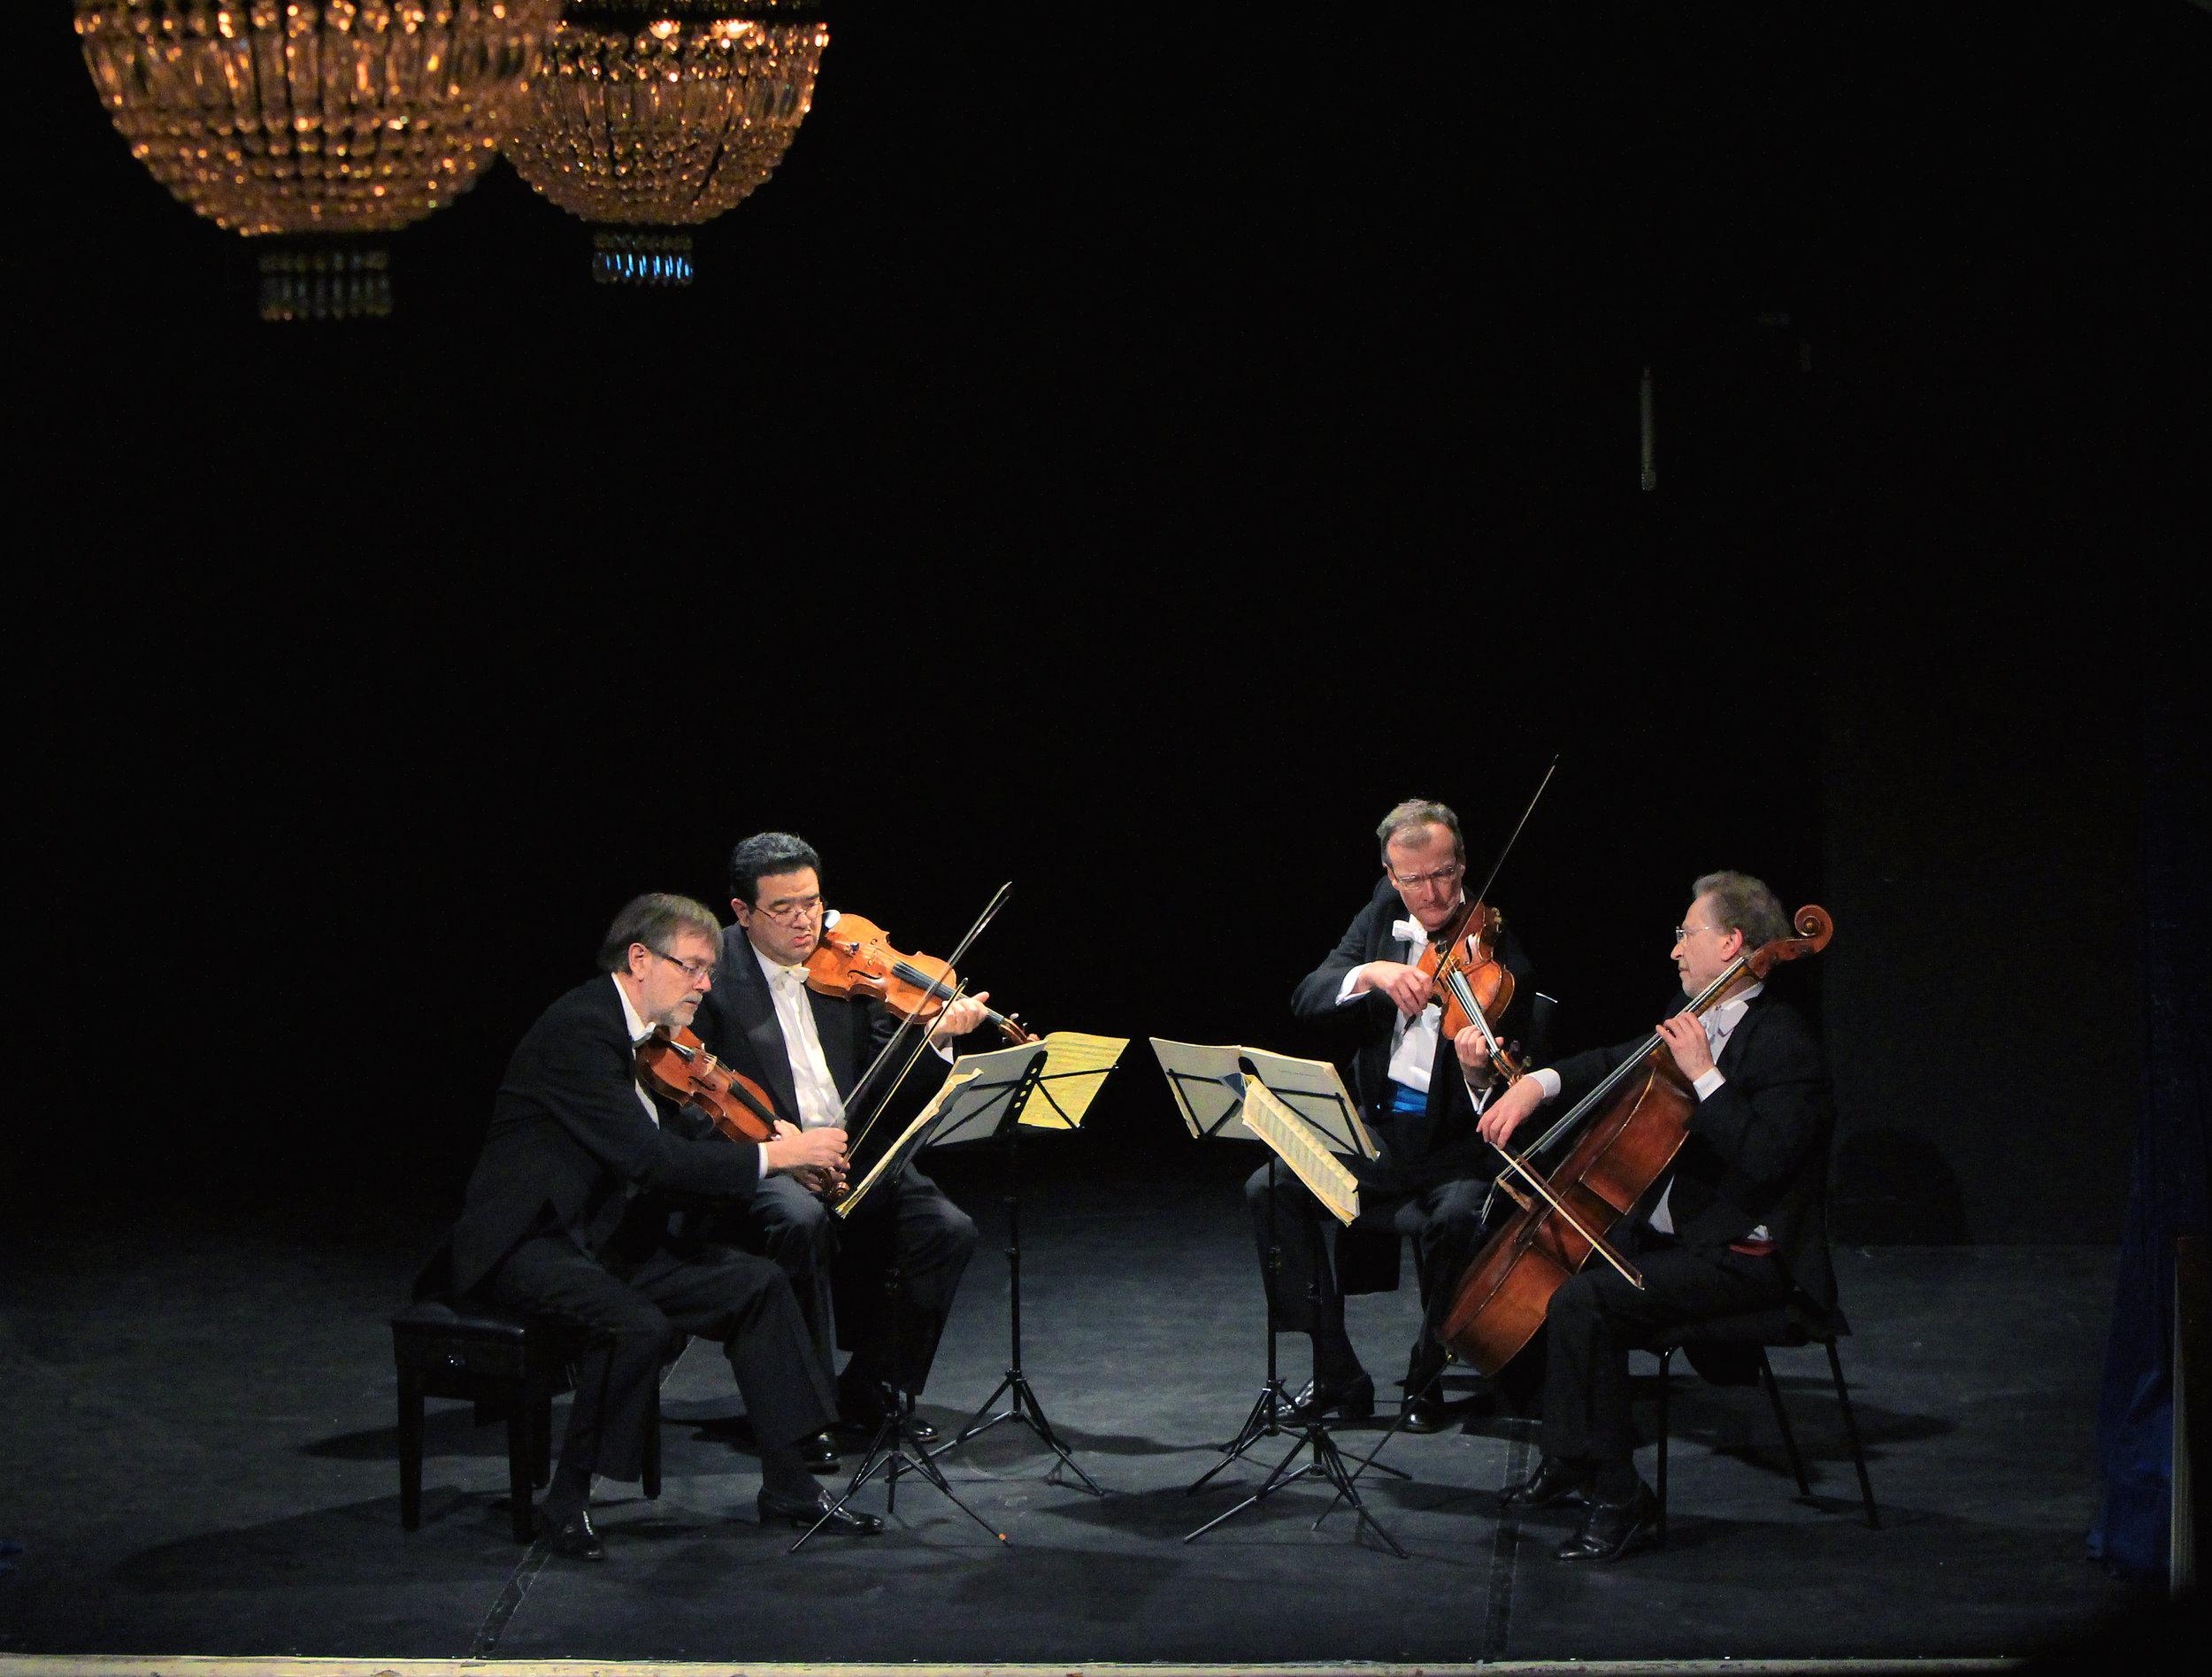 BEETHOVEN. TWENTY-FIVE YEARS OF QUARTET MAKING - february 25, 2015. londonThe Endellion String QuartetPoetry by Ruth PadelBeethoven -String Quartets, Op. 18 No. 6 & Op. 131